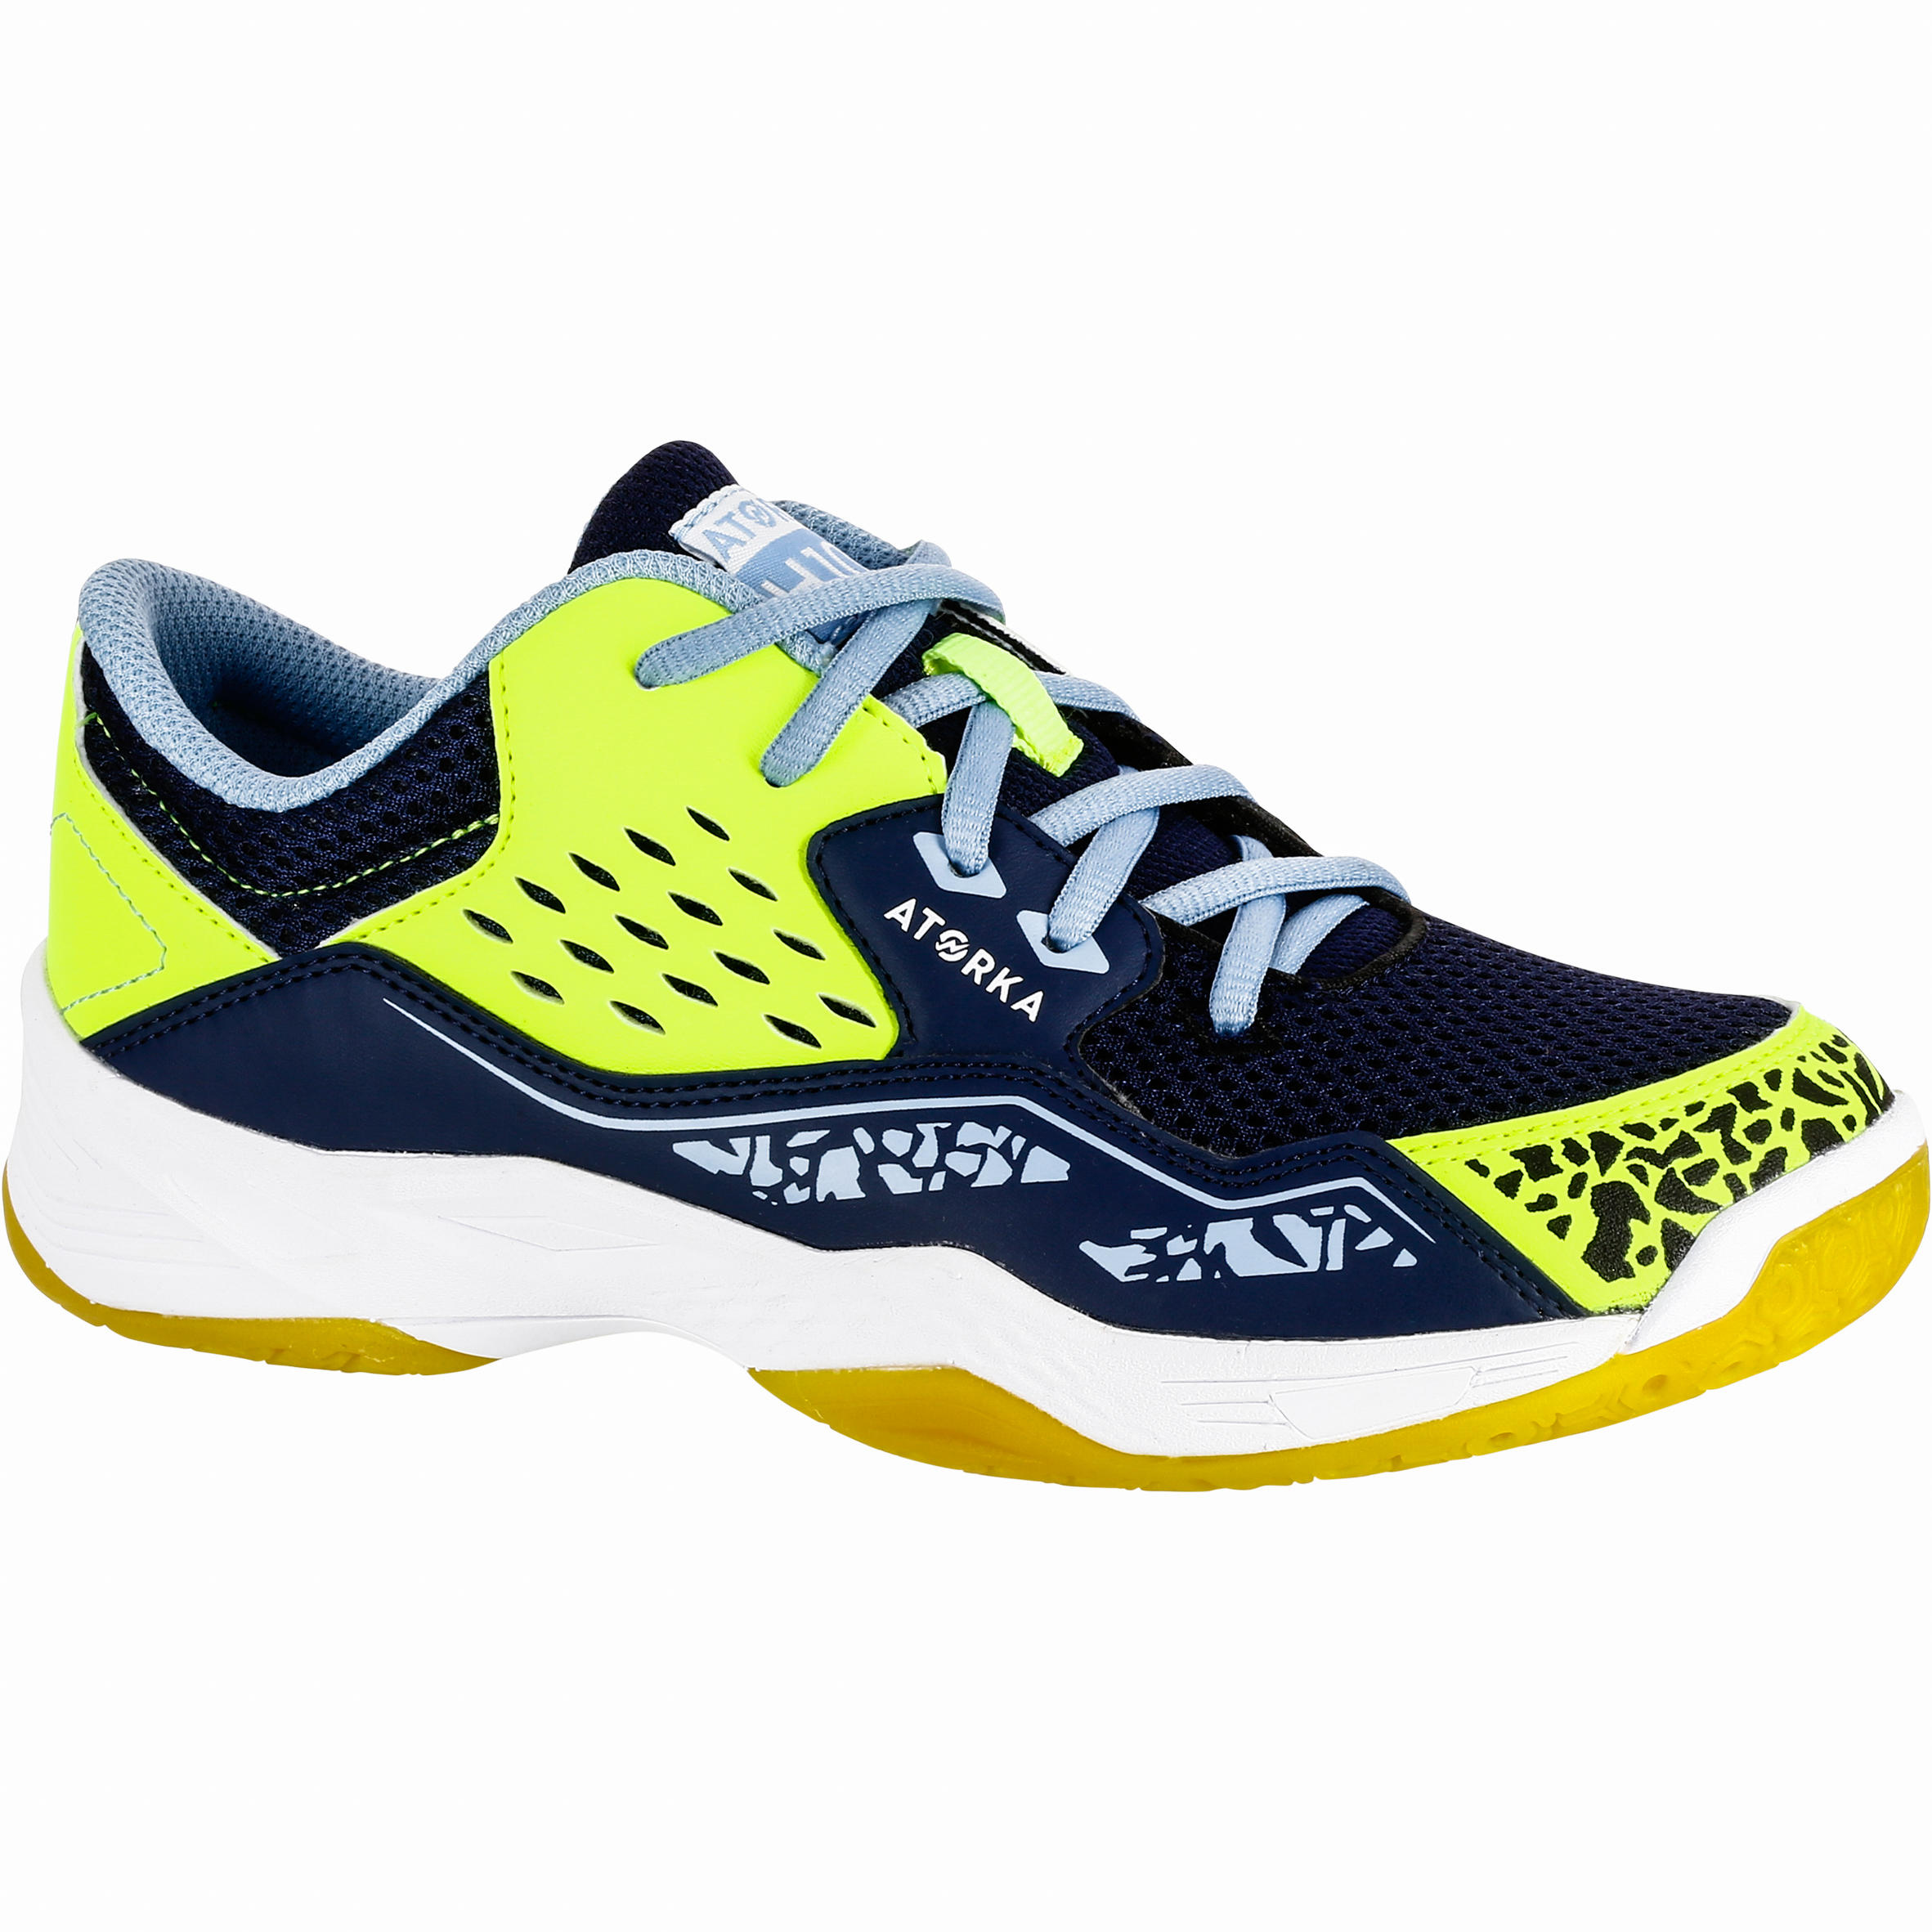 Chaussures de handball H100 garçon avec autoaggripant bleues et jaunes